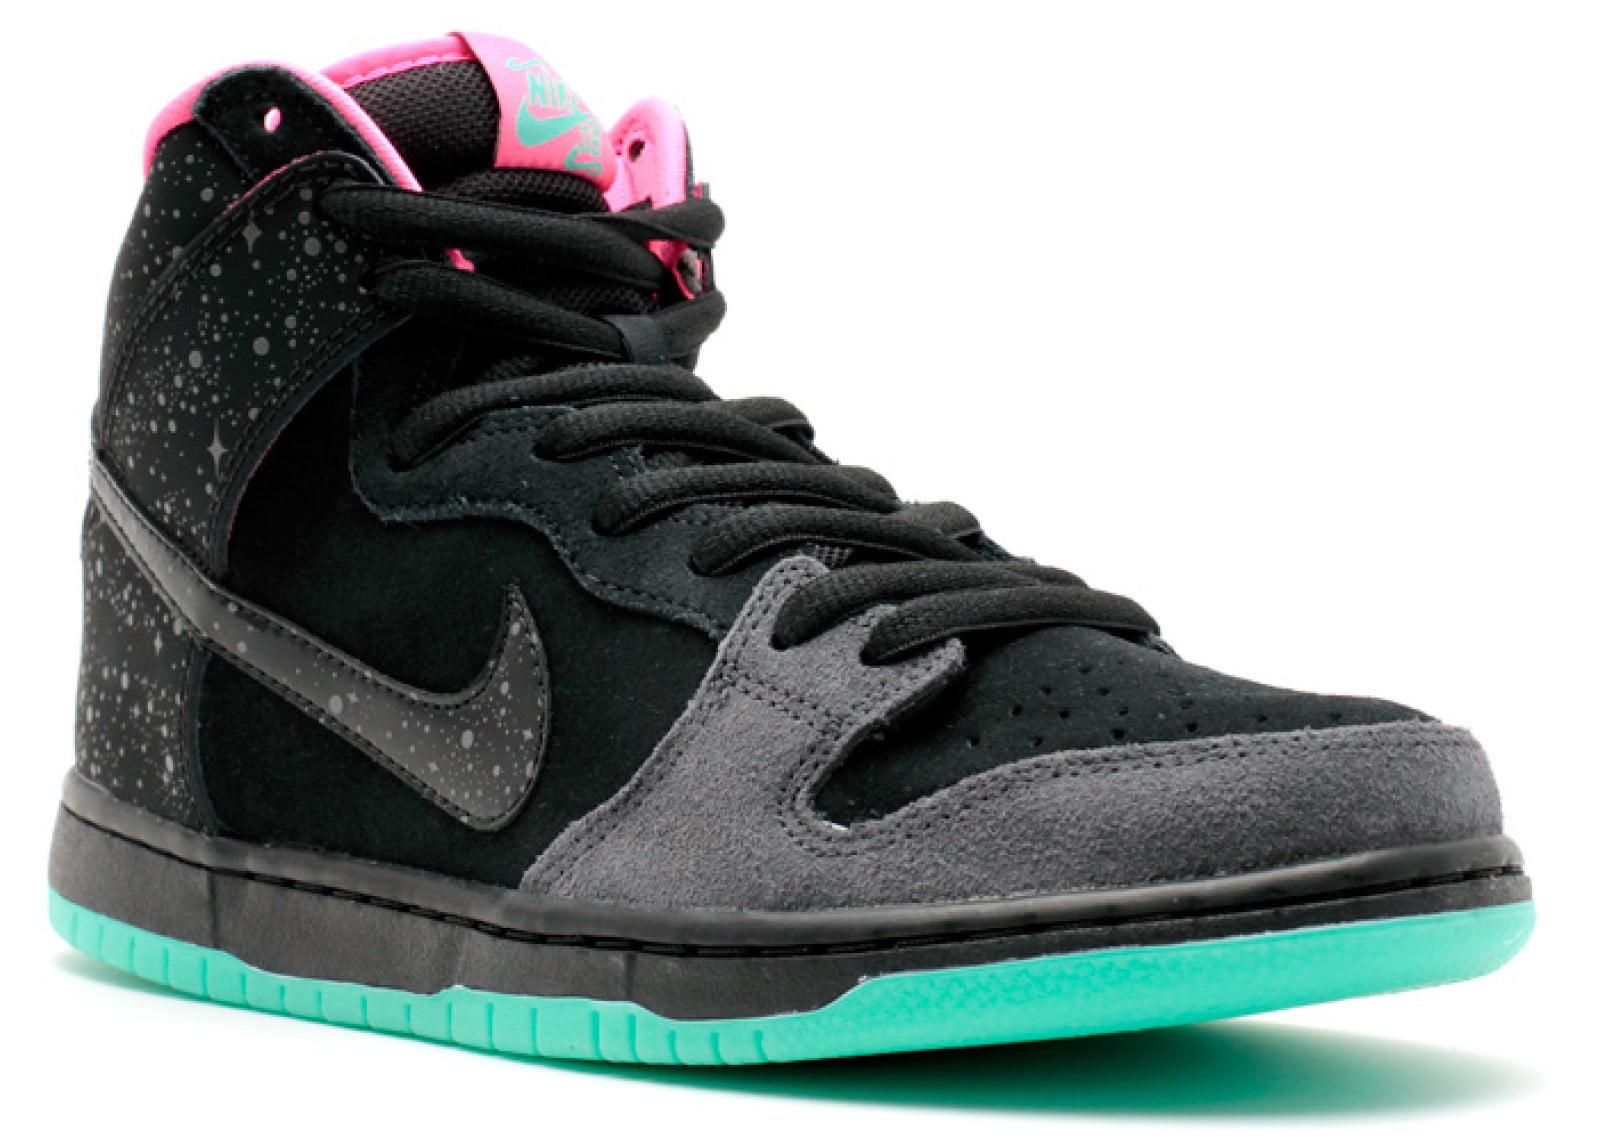 Nike - DUNK HIGH PREMIUM SB 'NORTHERN